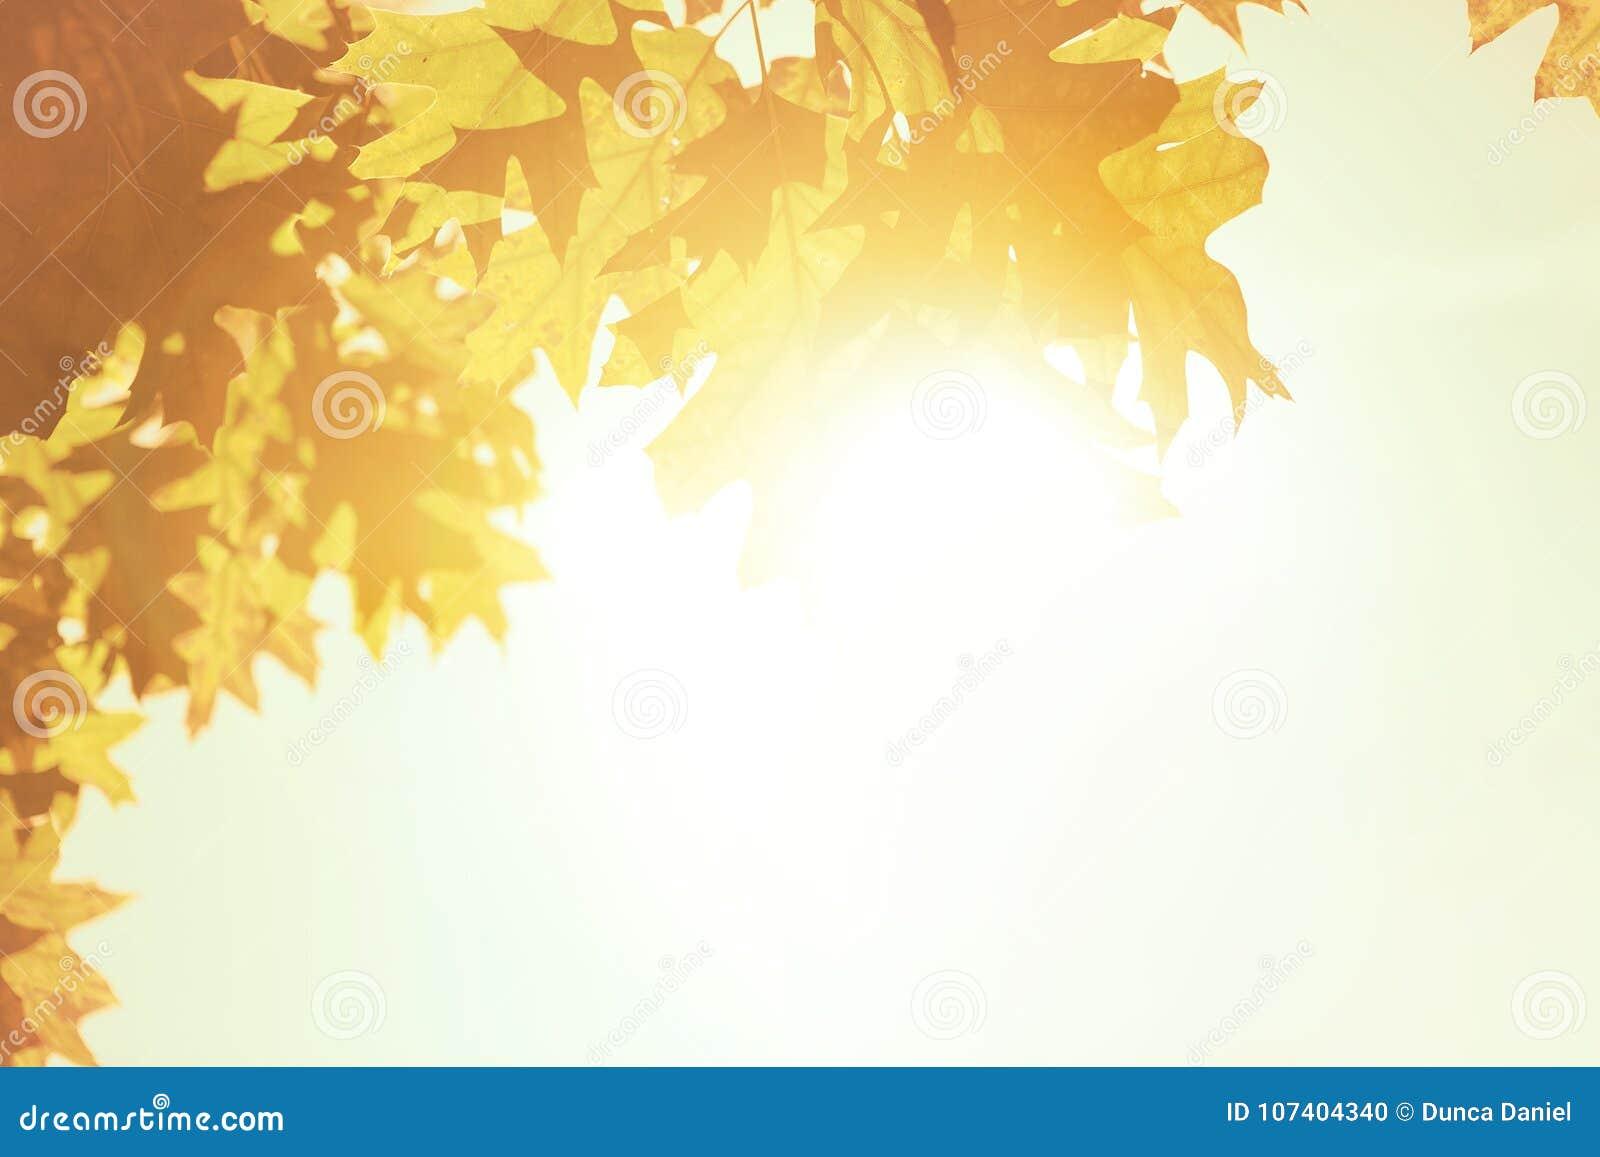 Autumn leaves background over morning sunlight